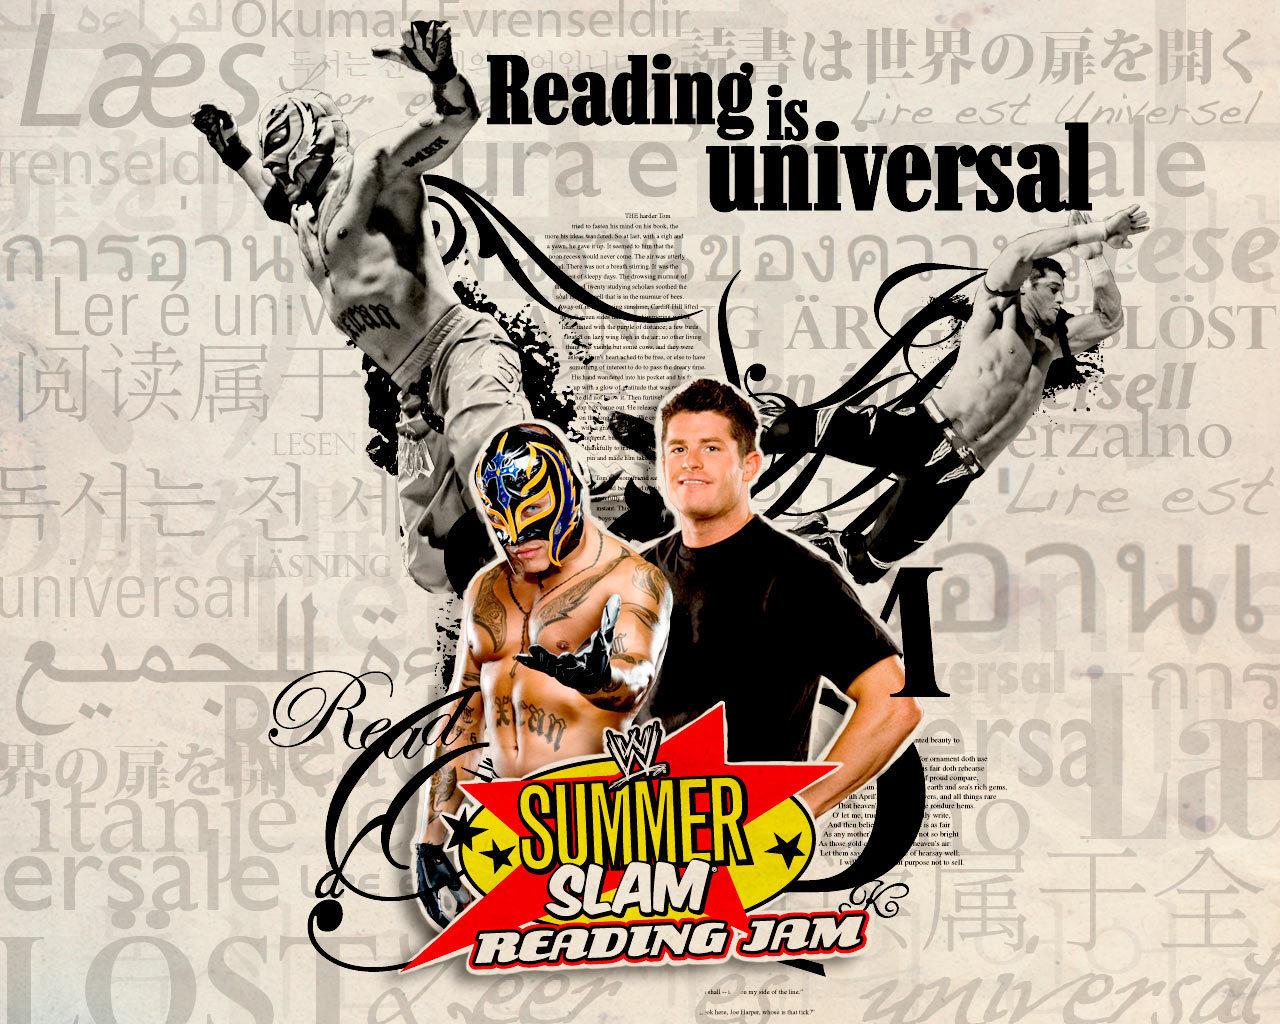 http://1.bp.blogspot.com/-6eURP0yJxfk/UFYwpBbio-I/AAAAAAAAFCA/cEYr44cf6KM/s1600/Summerslam-Reading-Jam-2009-professional-wrestling-.jpg